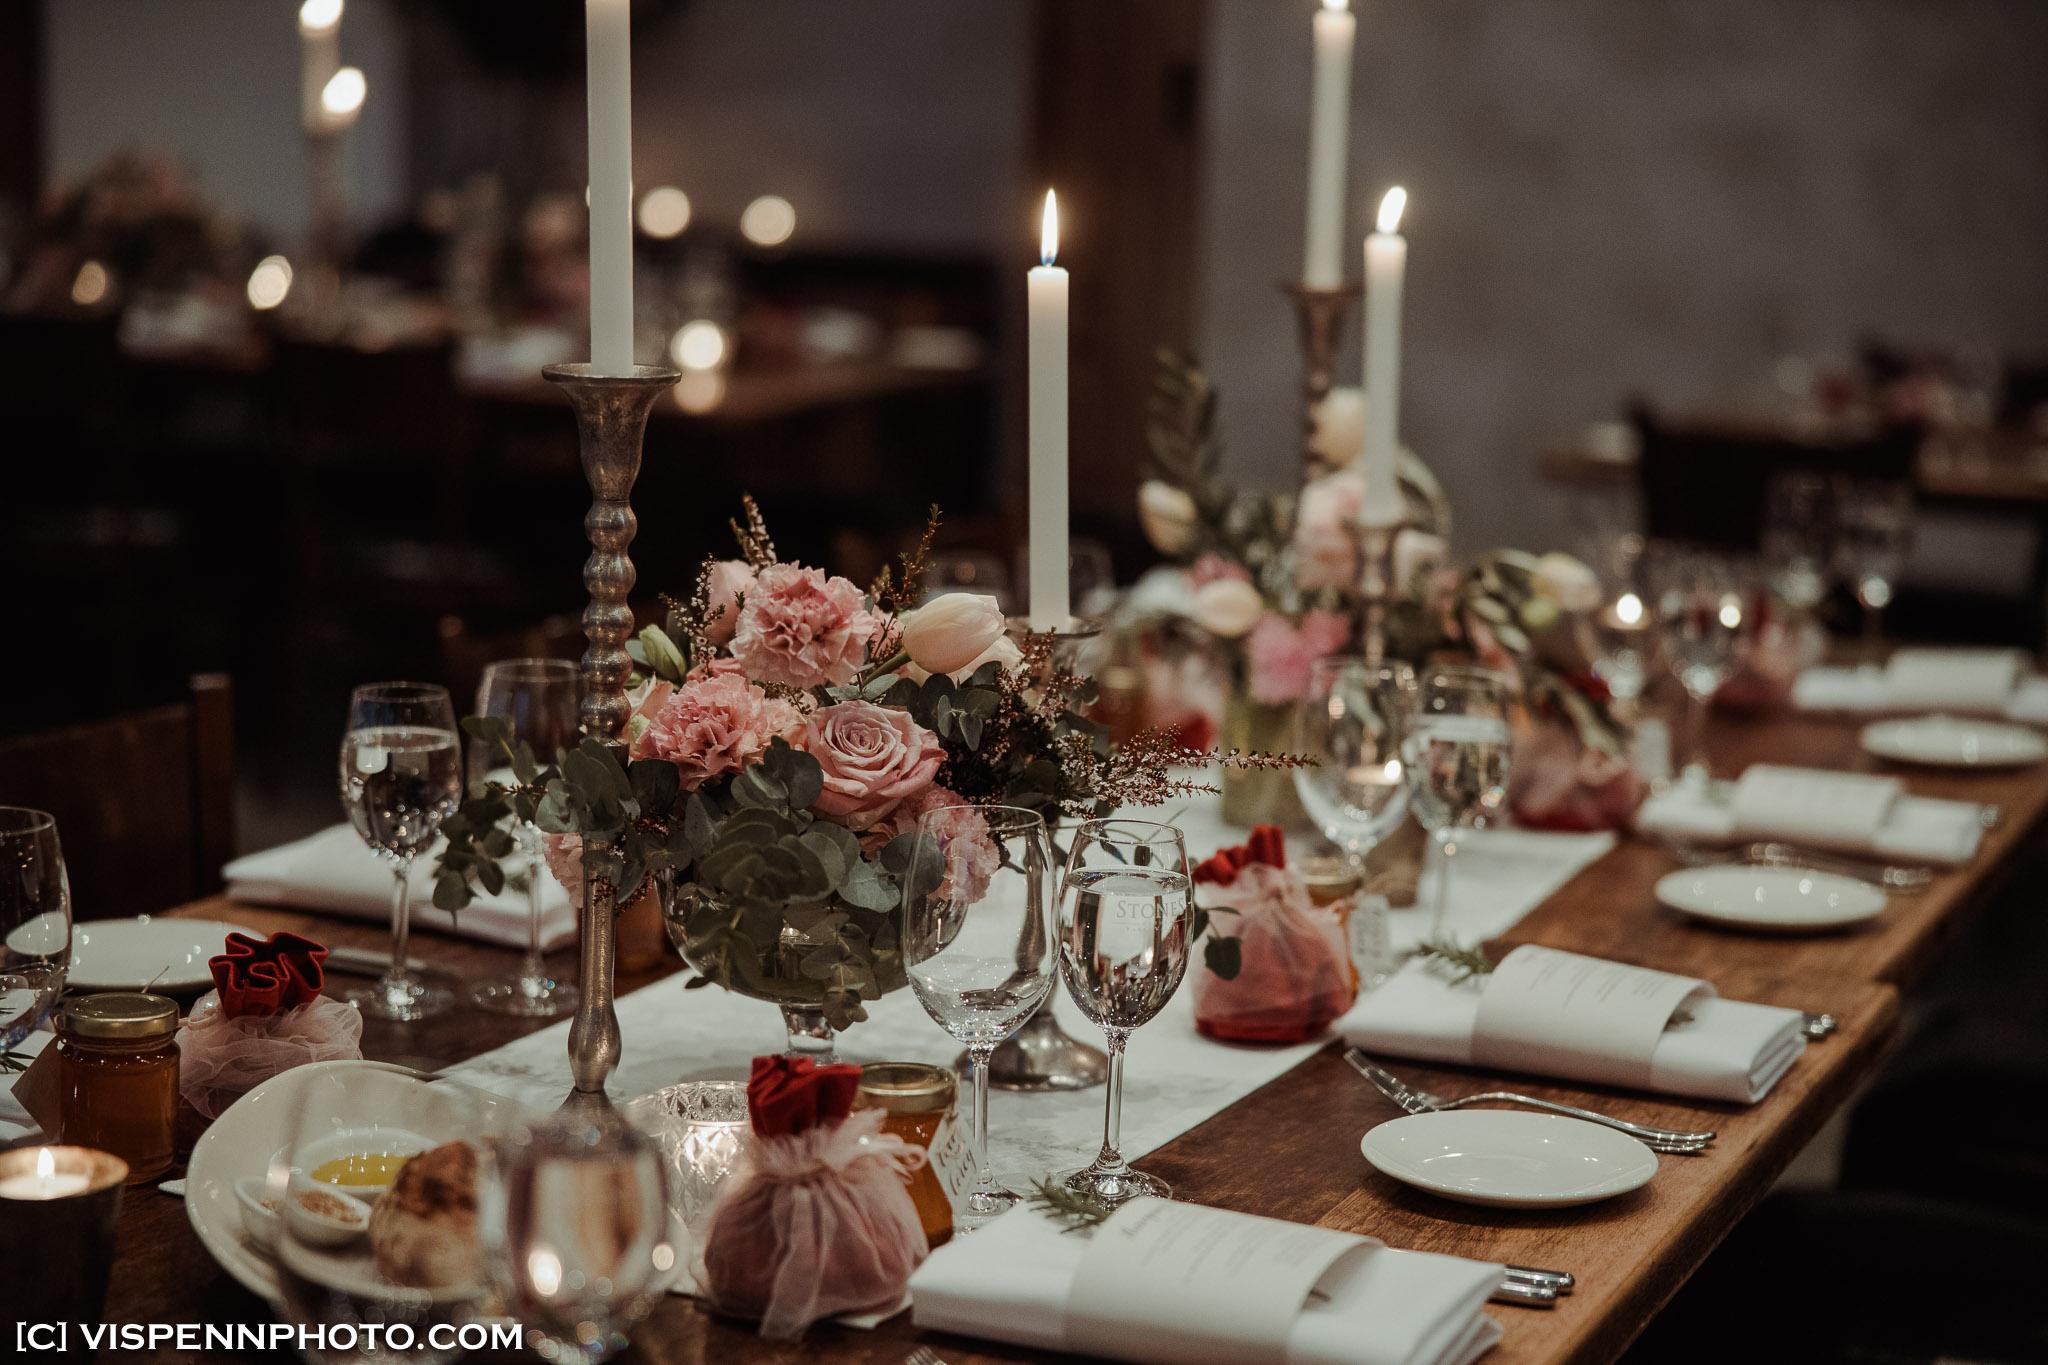 WEDDING DAY Photography Melbourne CoreyCoco 1P 04738 EOSR ZHPENN